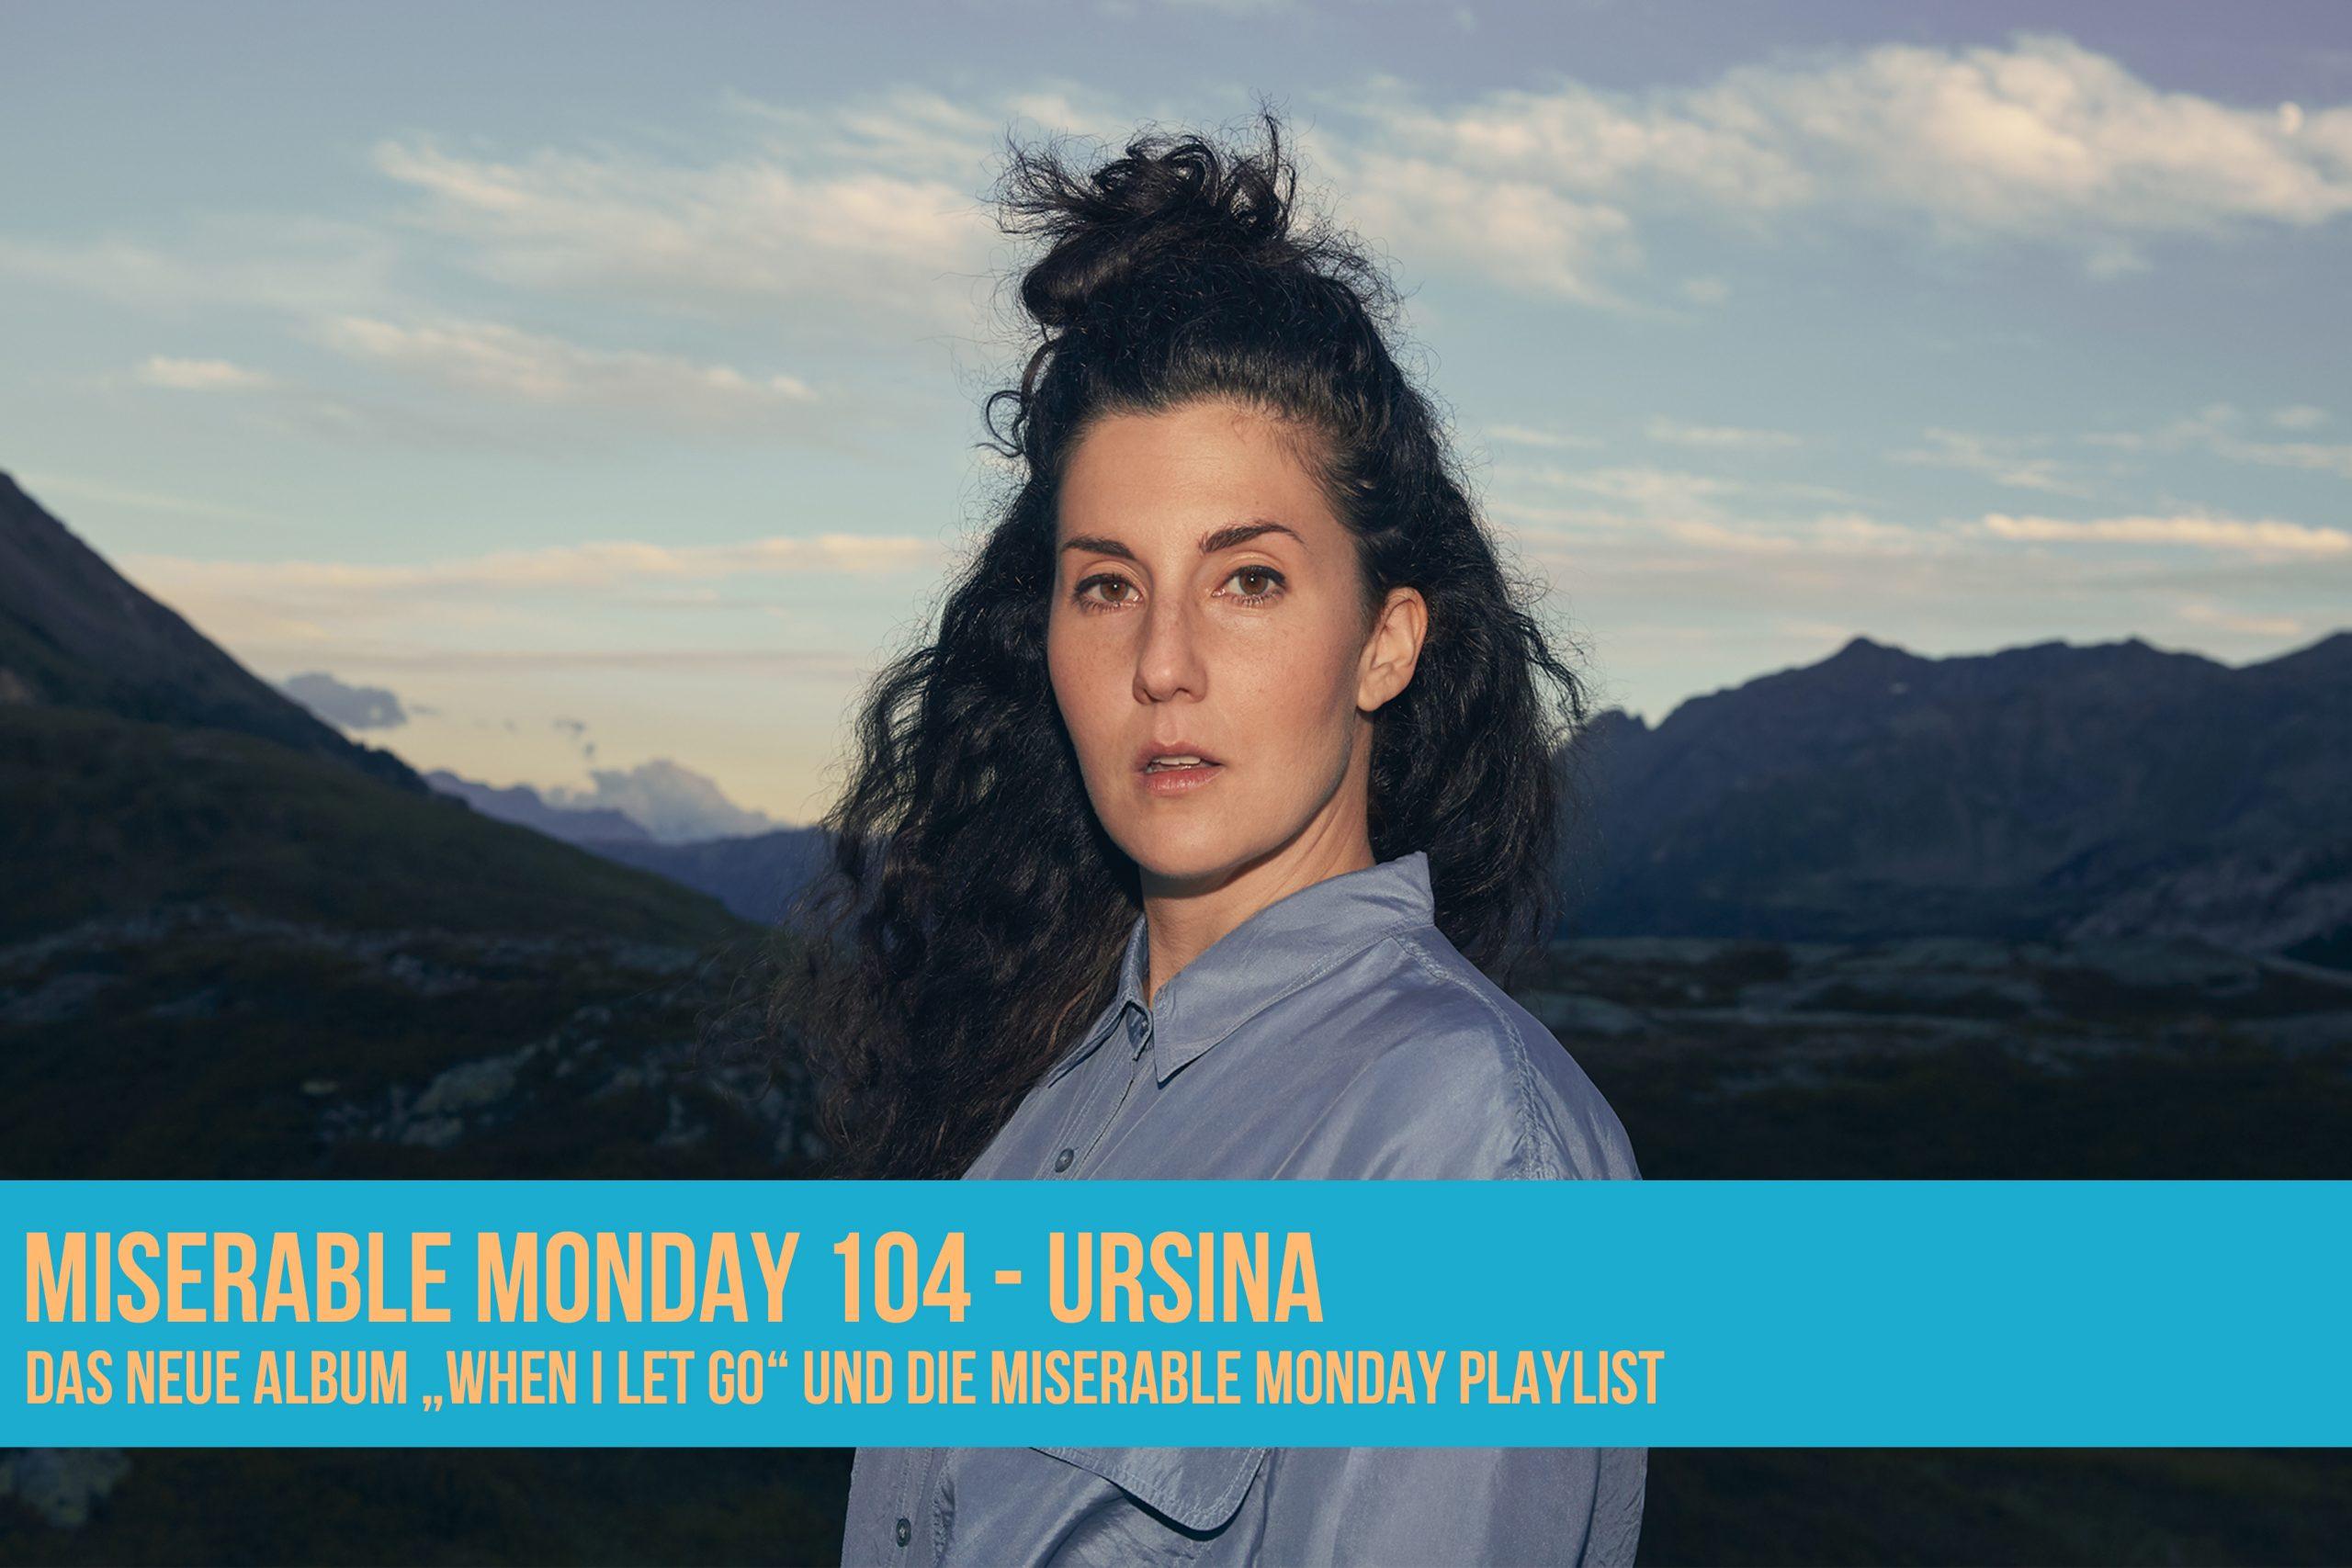 104 - Ursina